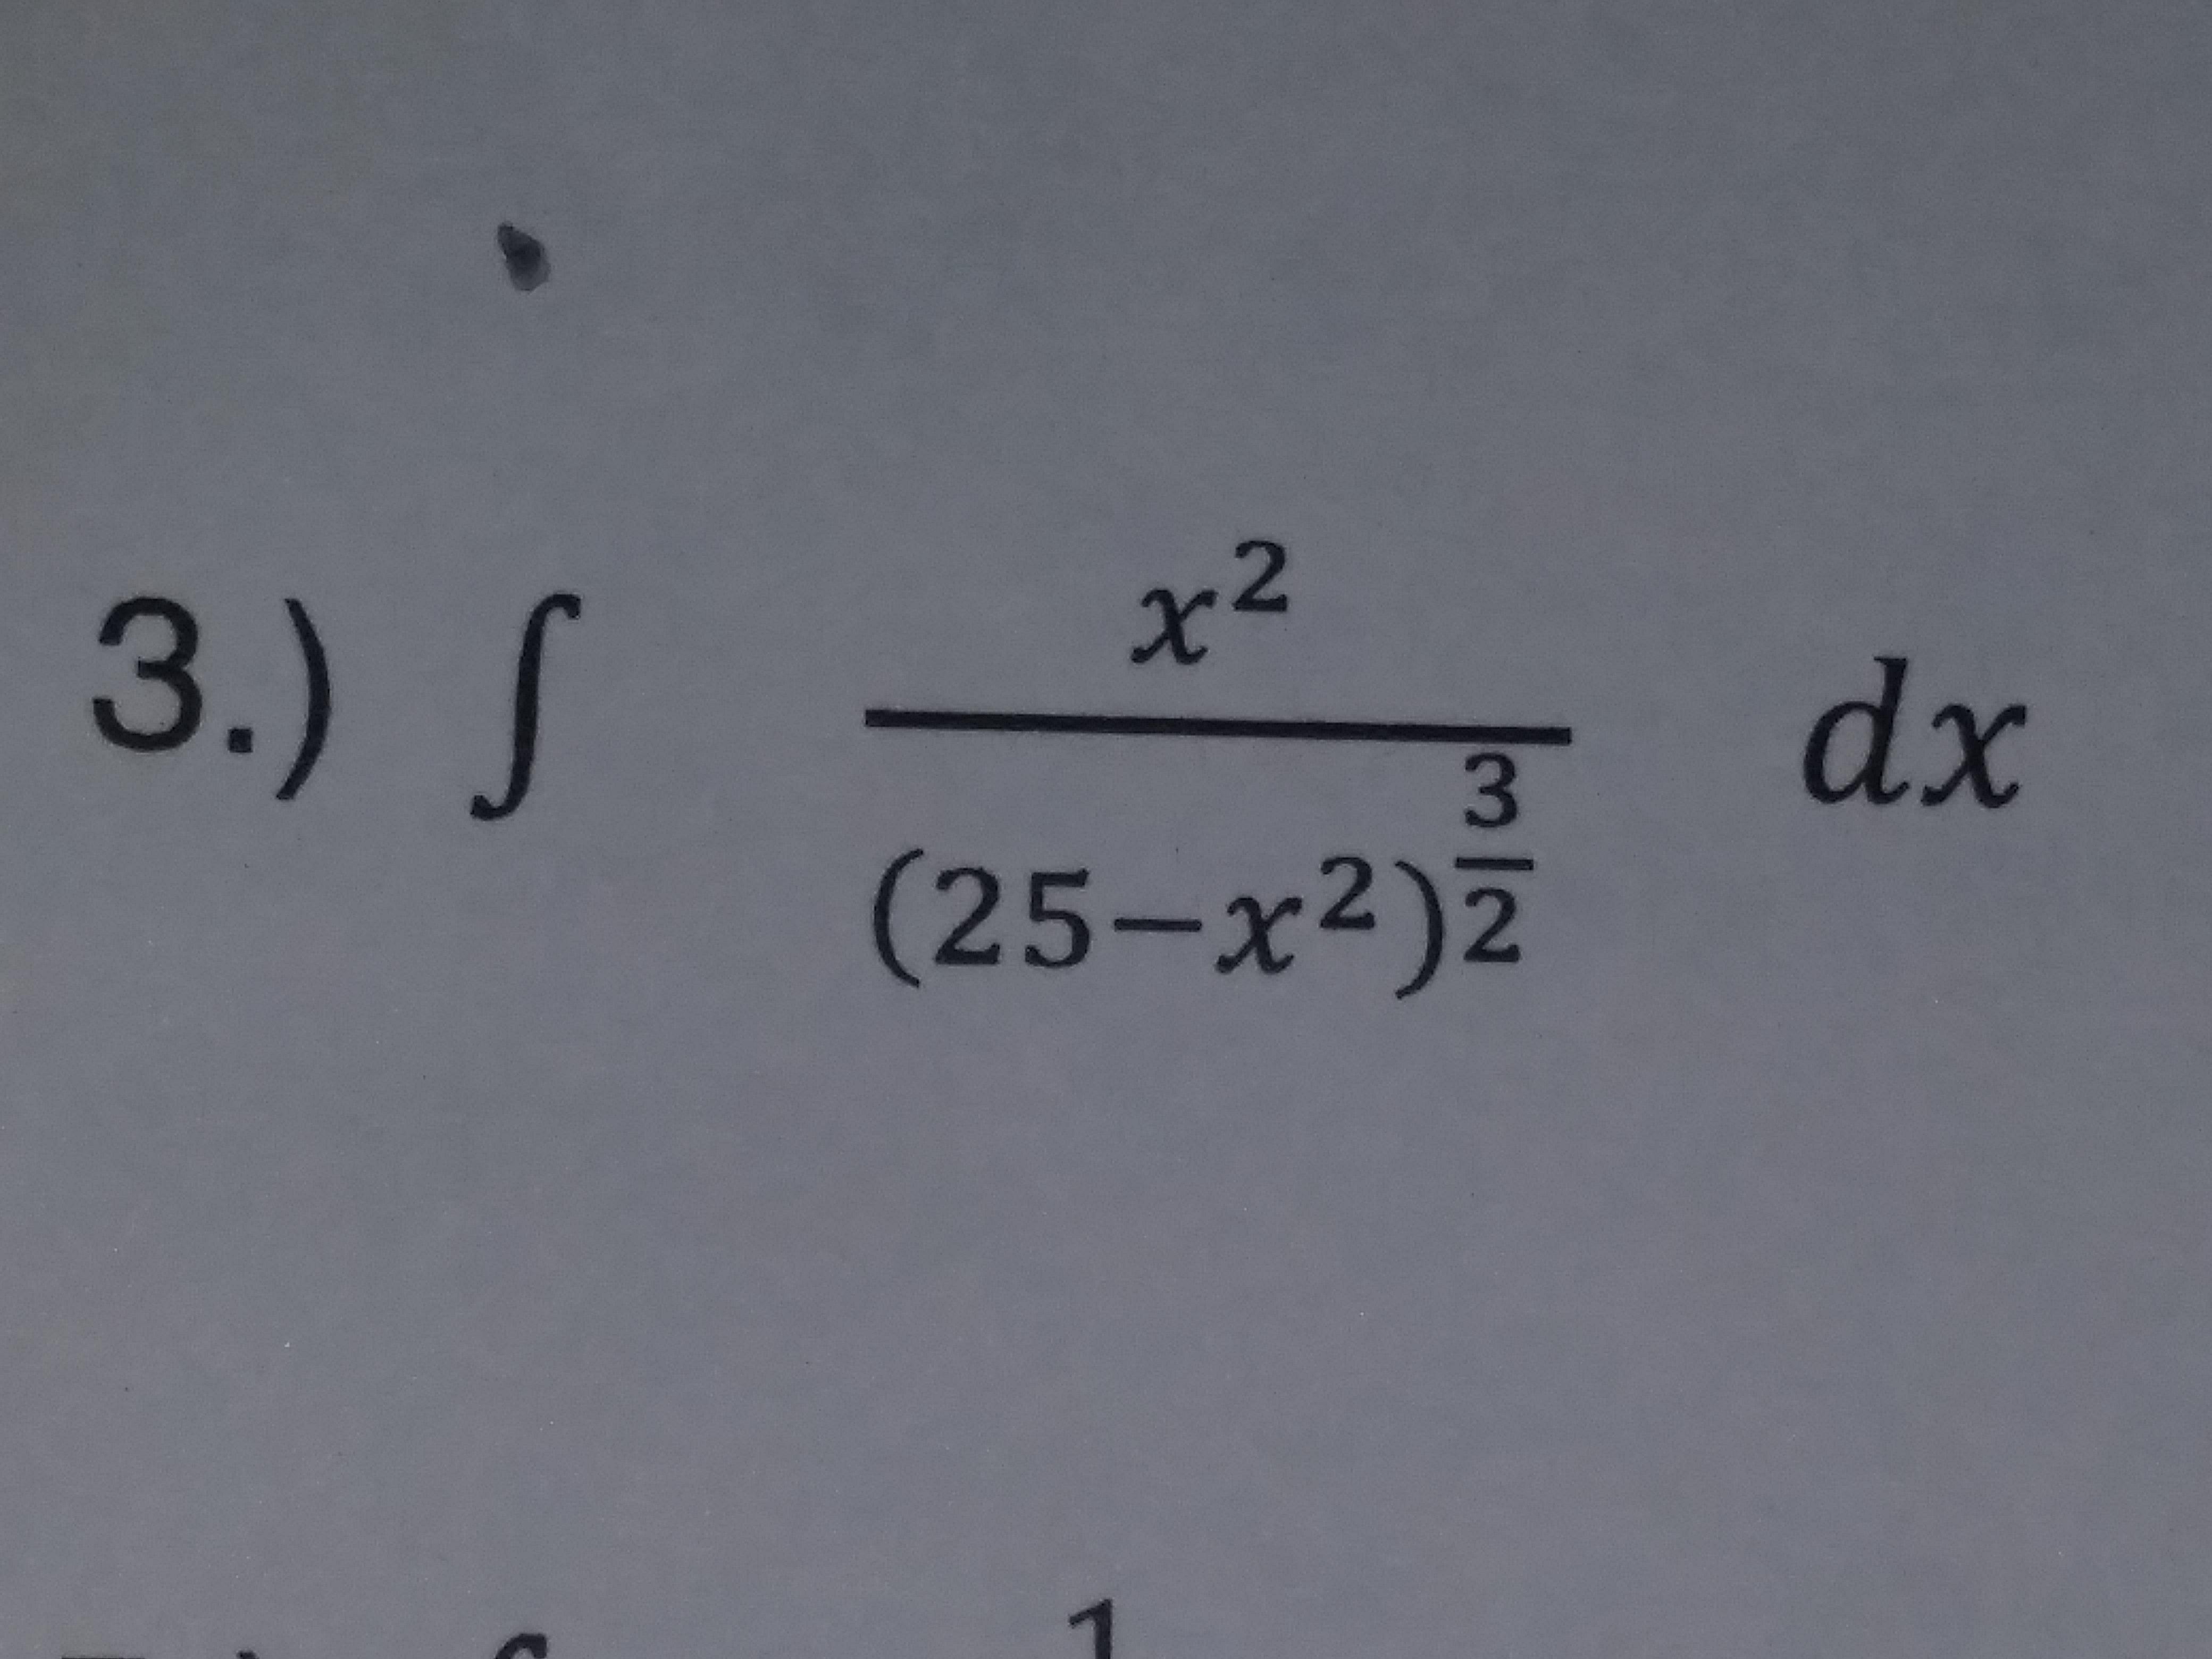 2 3 (25-x2) 2